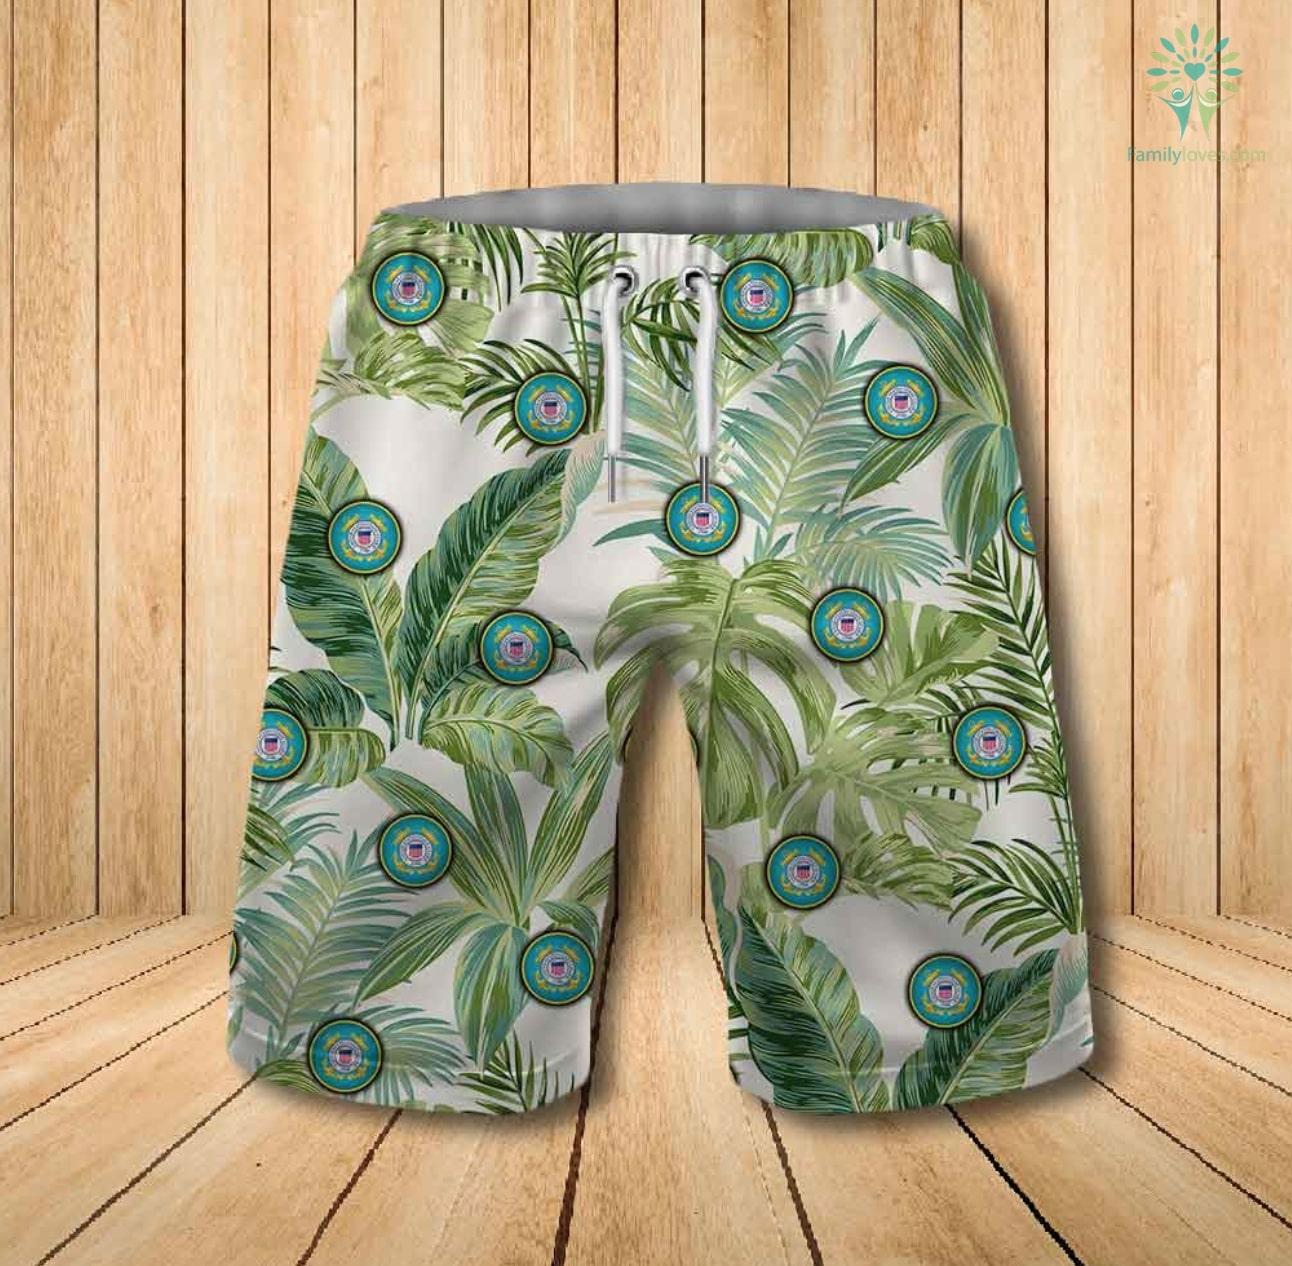 US coast guard all over printed hawaiian shorts